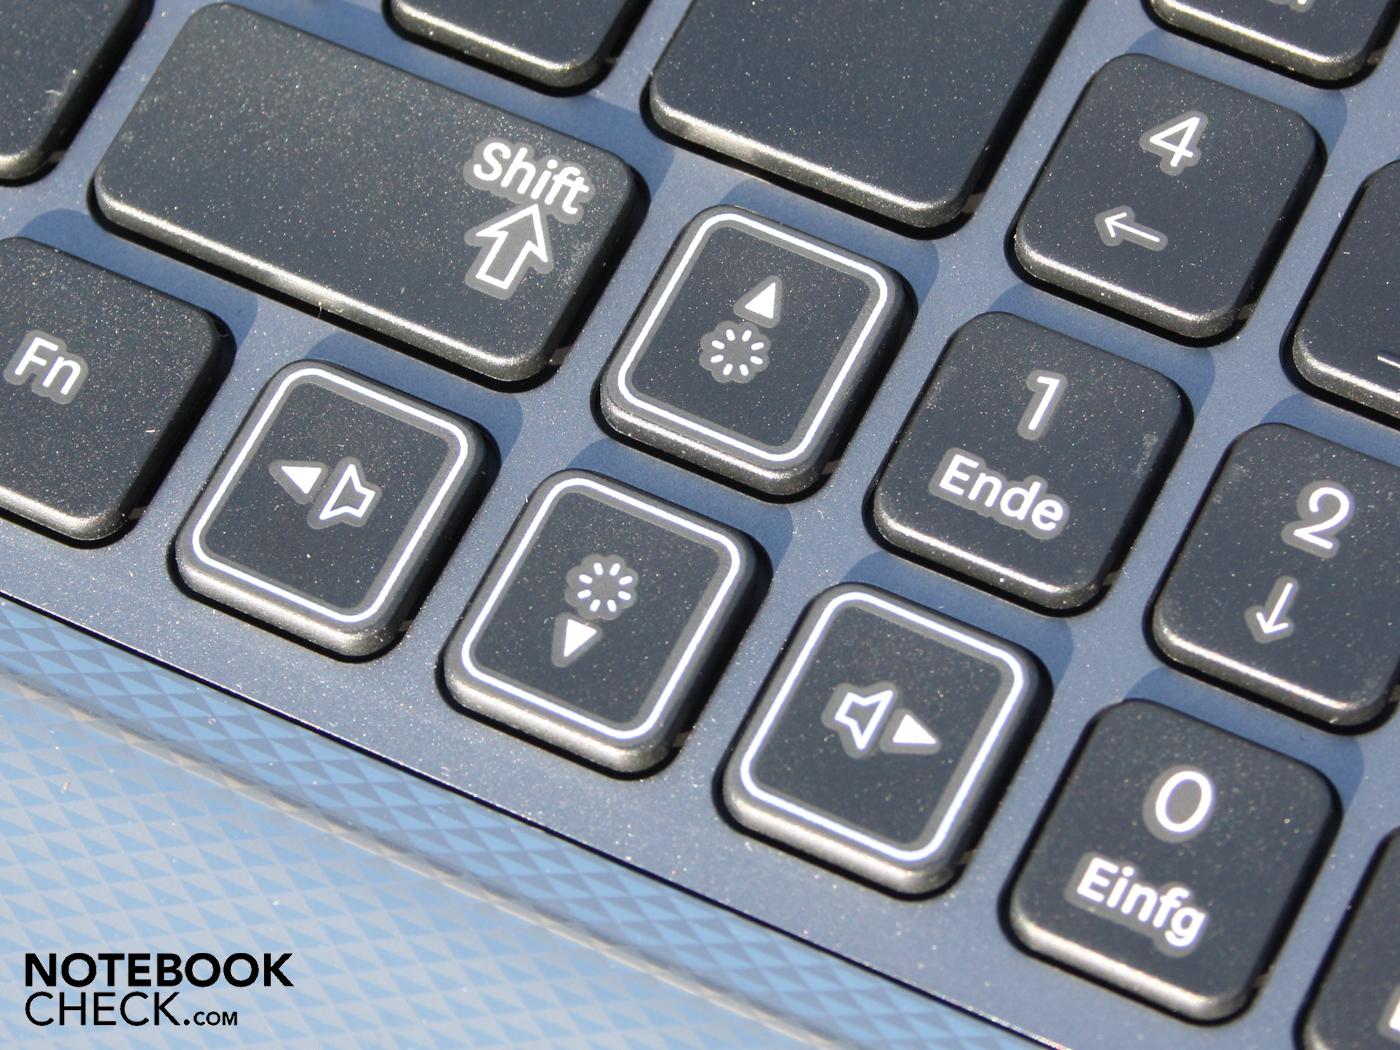 Notebook samsung lançamento 2013 - Marked Arrow Keys